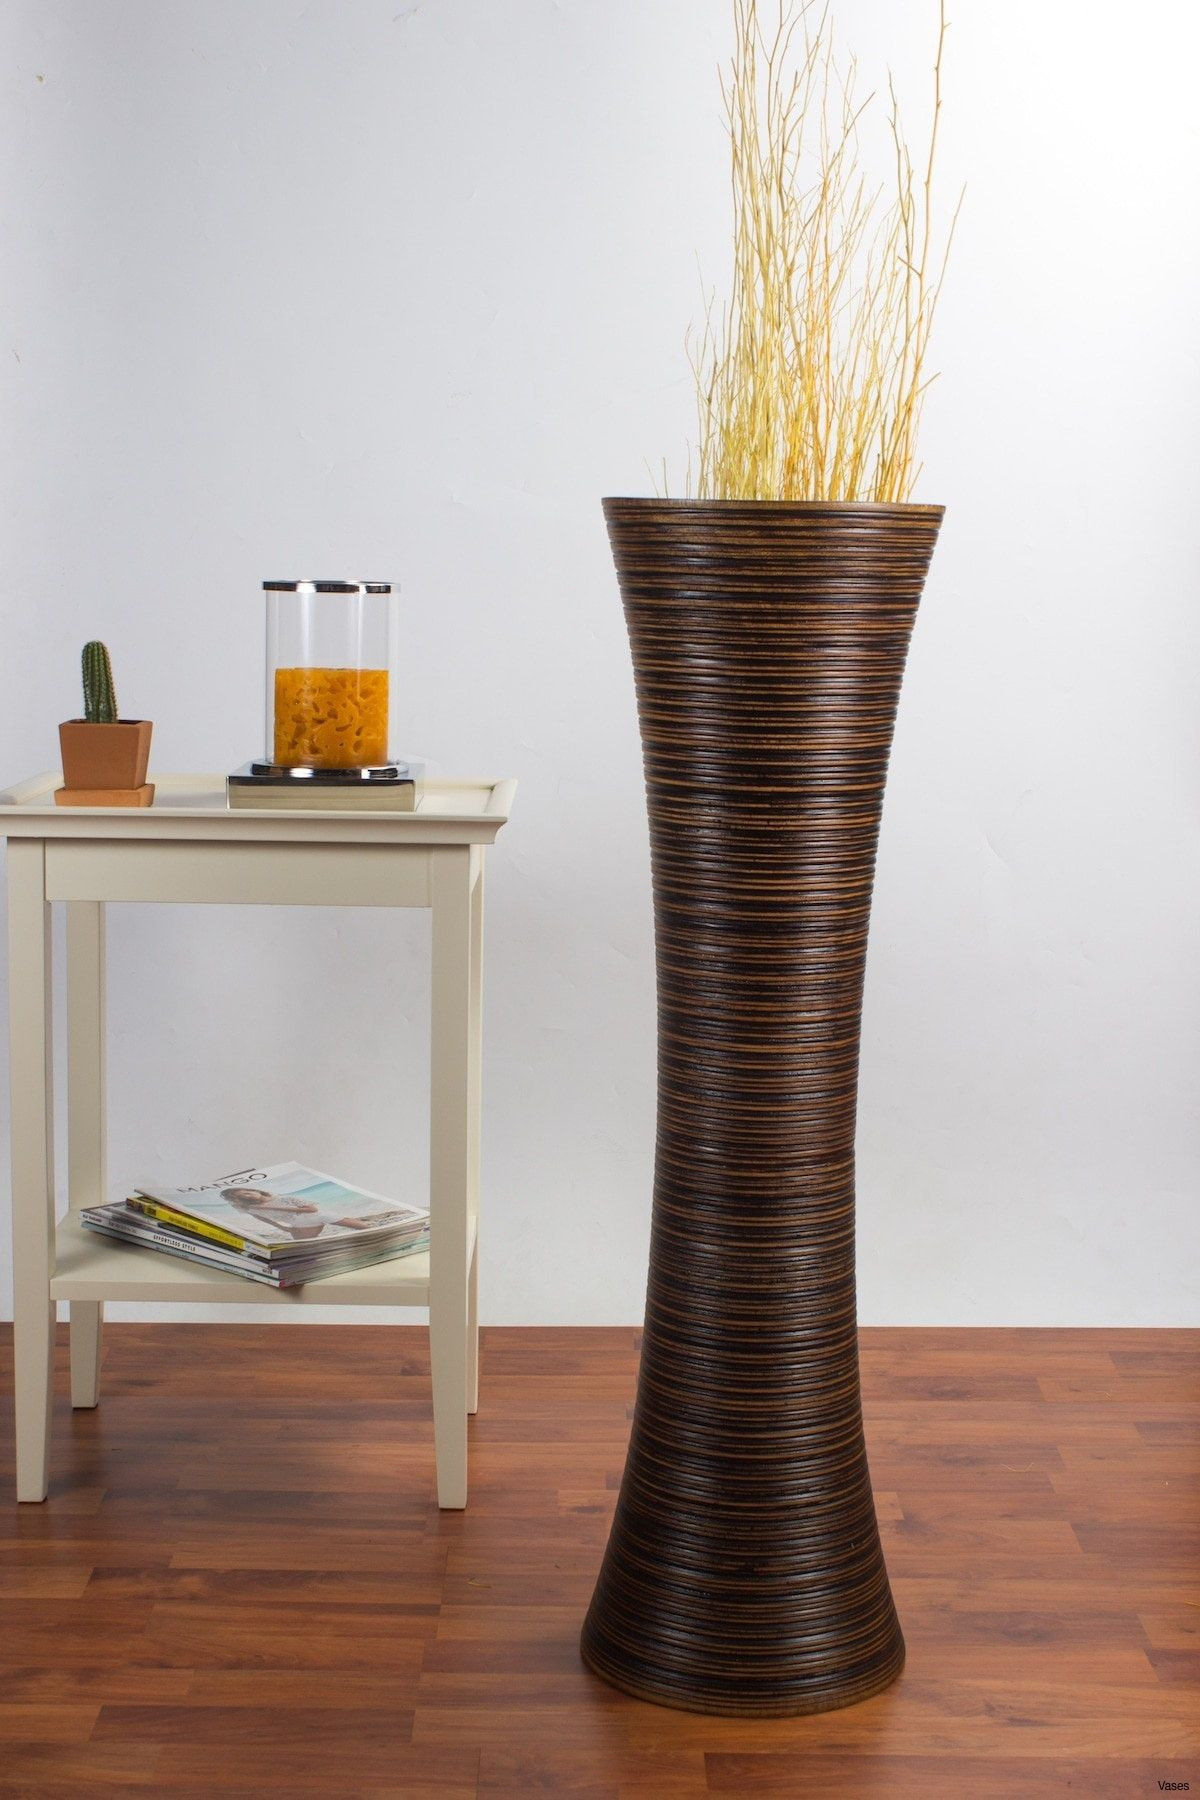 vase for sticks of tall decorative vases luxury decorative floor vases fresh d dkbrw with regard to tall decorative vases luxury decorative floor vases fresh d dkbrw 5749 1h vases tall brown i